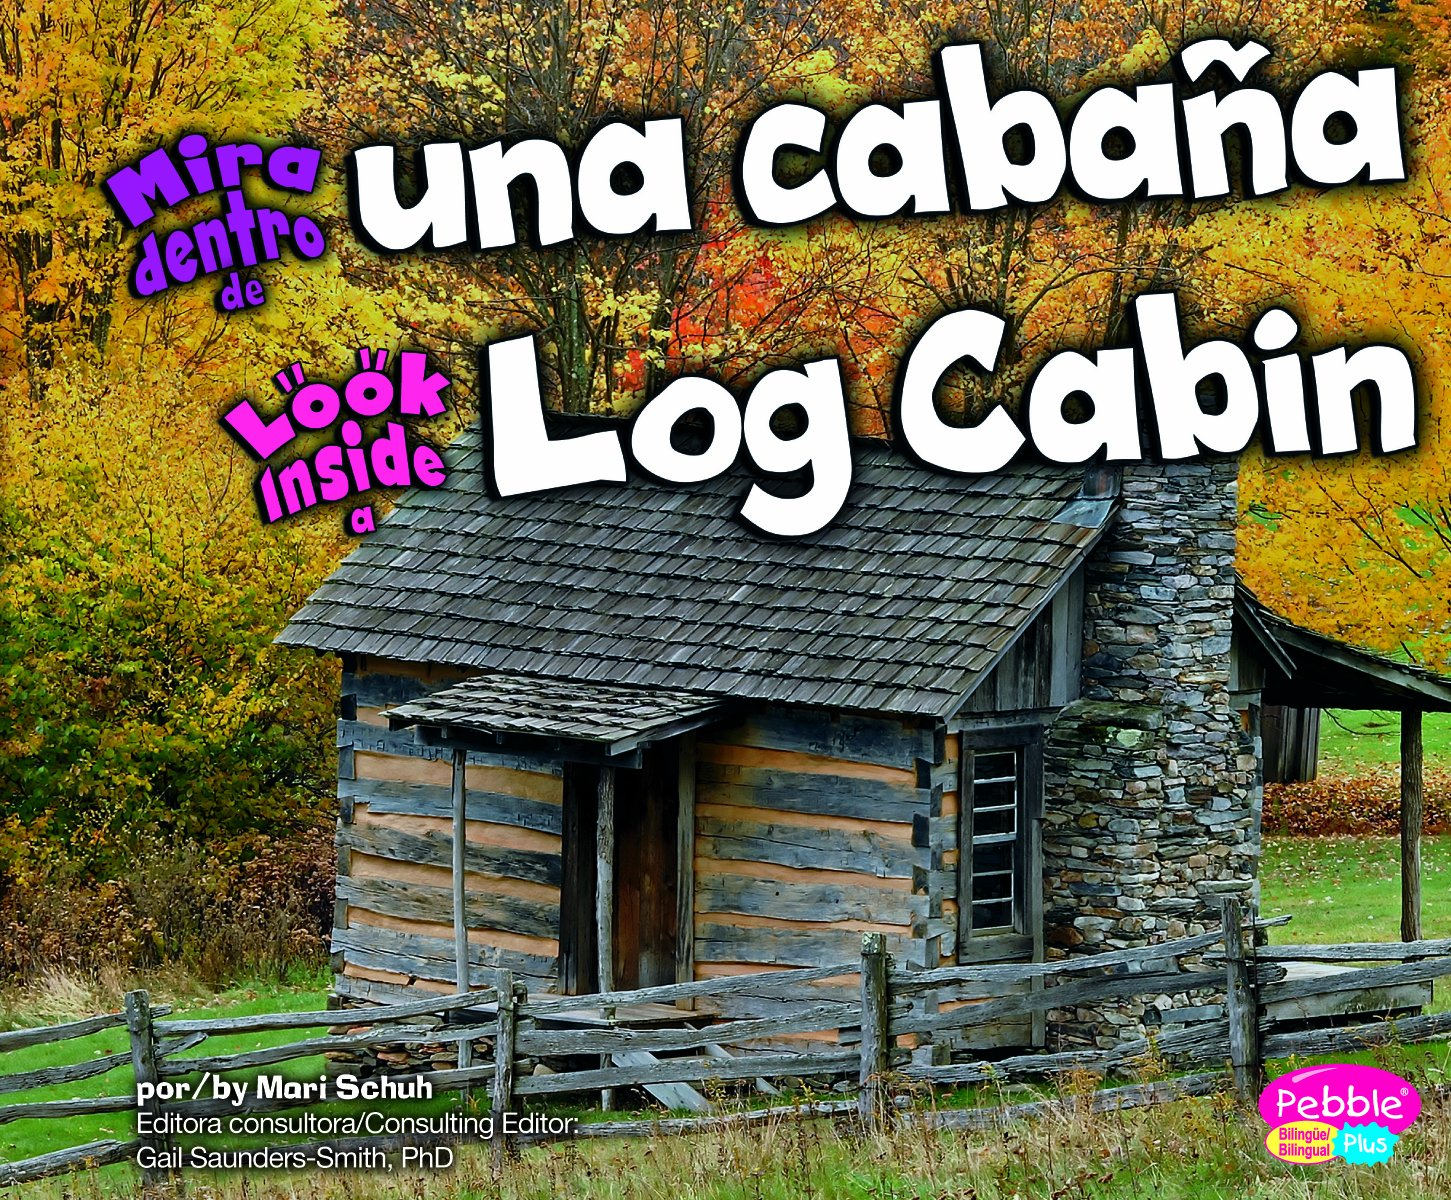 Mira dentro de una cabaña/Look Inside a Log Cabin (Mira dentro/Look Inside) (Multilingual Edition)